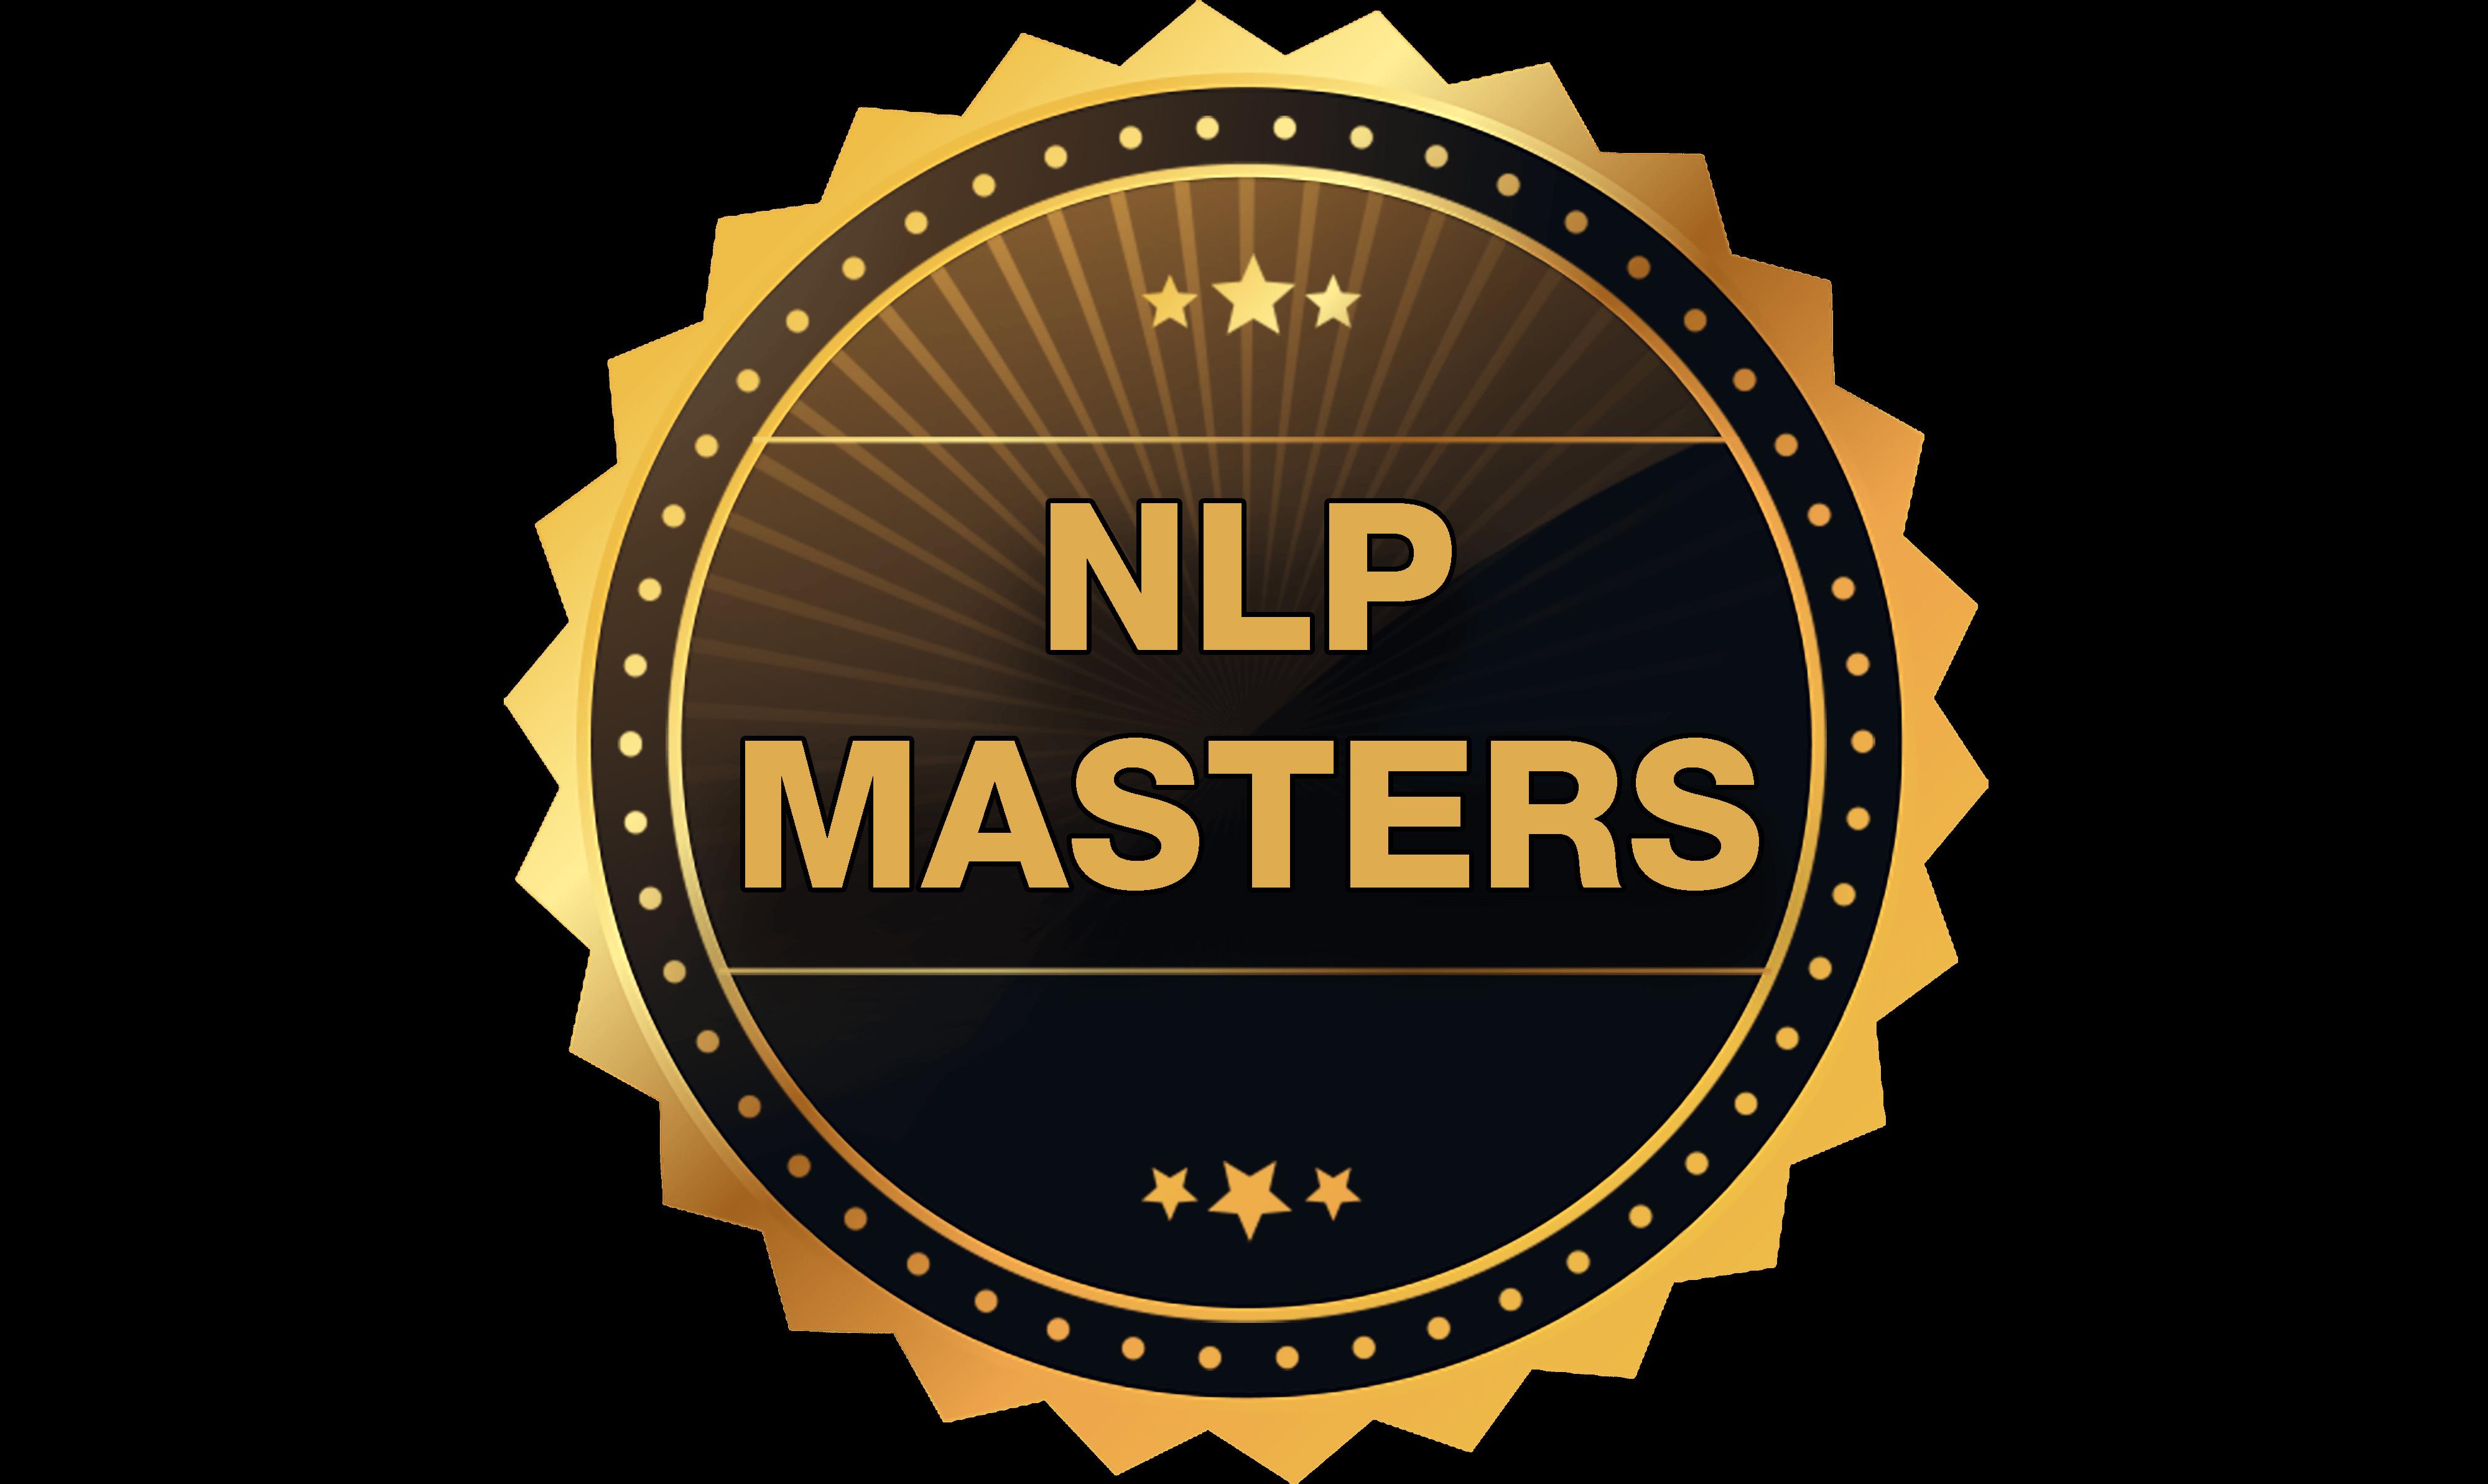 NLP Masters logo